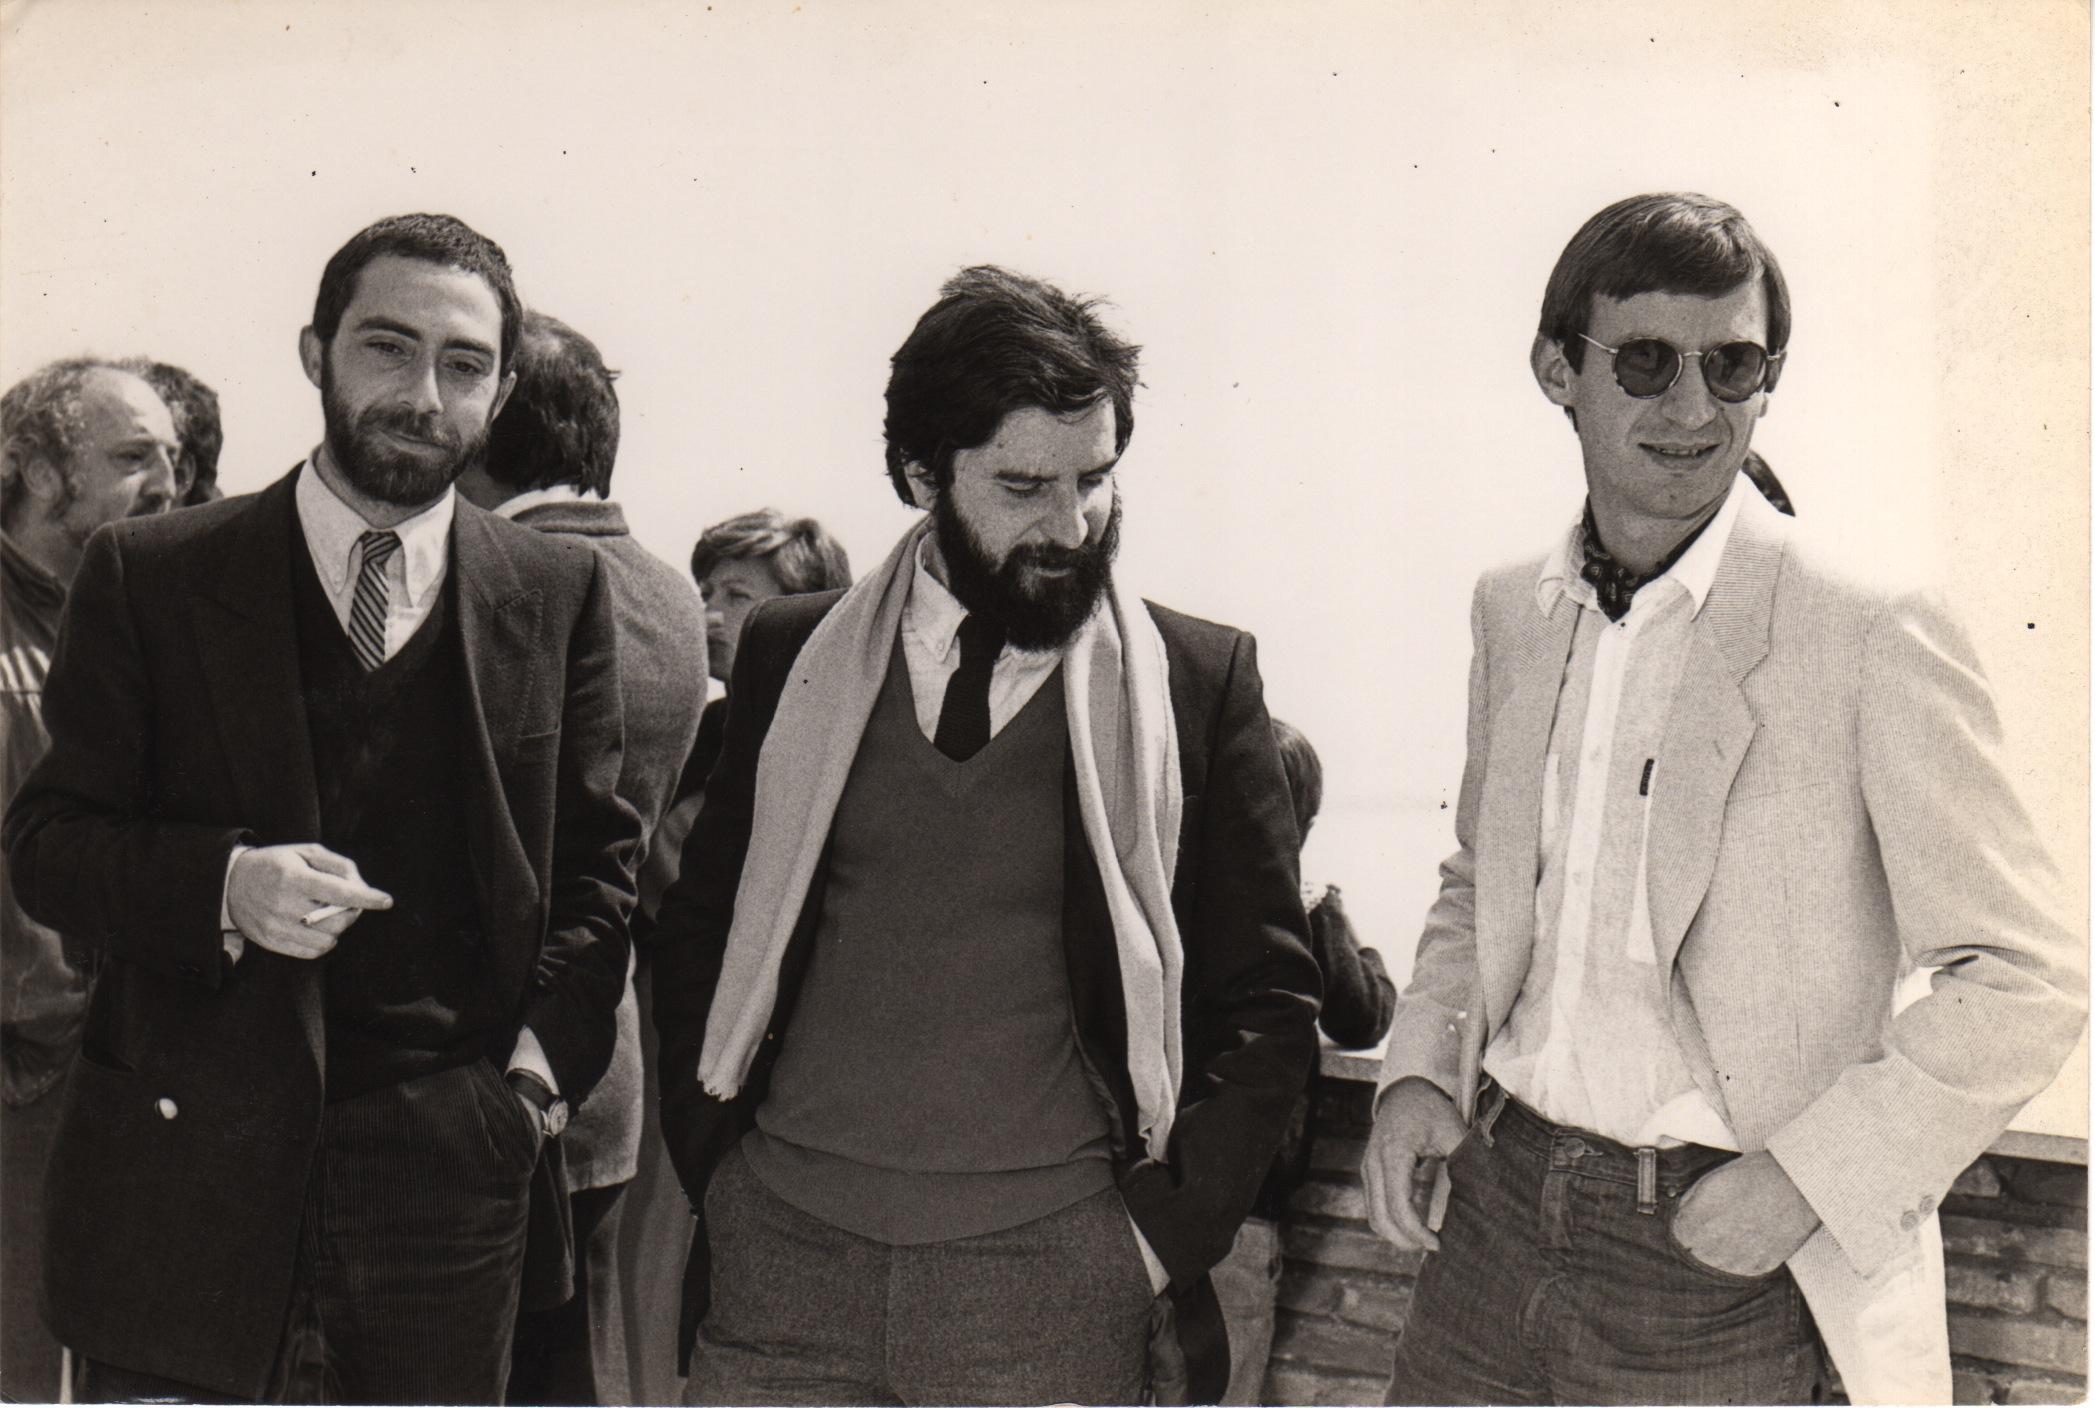 Antonio D'Avossa, Paolo Balmas, Marco Meneguzzo